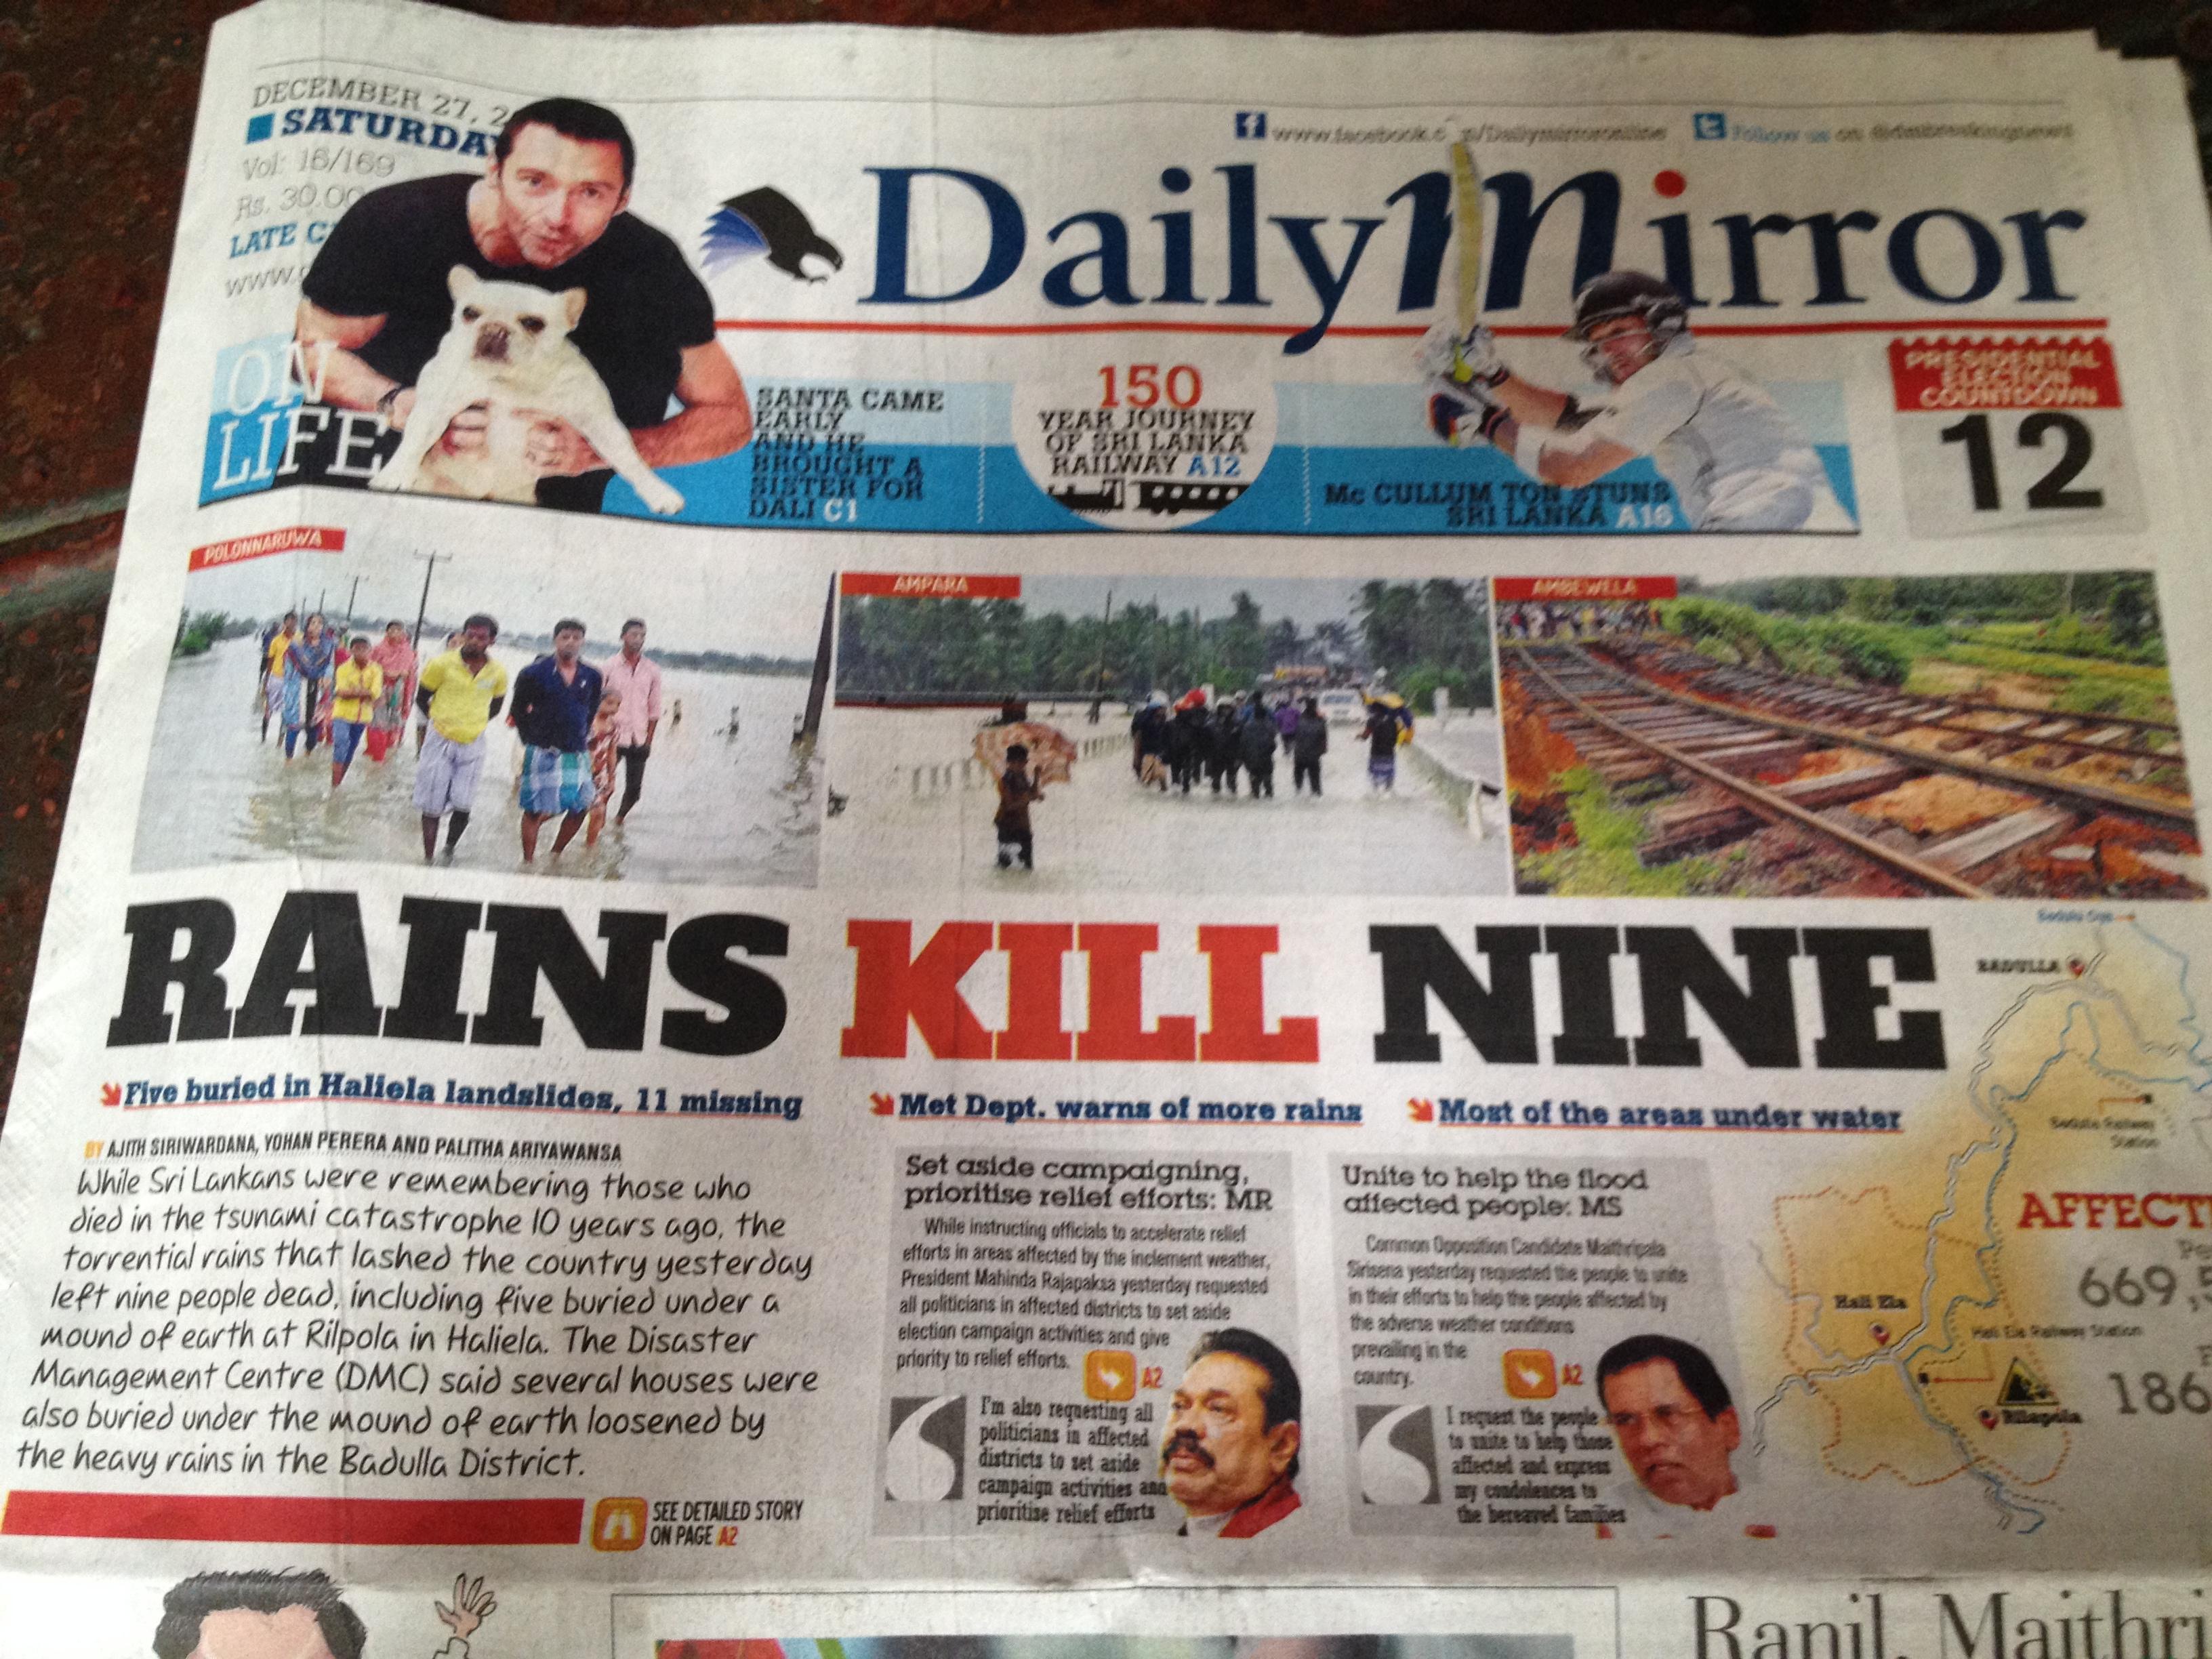 Colombonewspaper